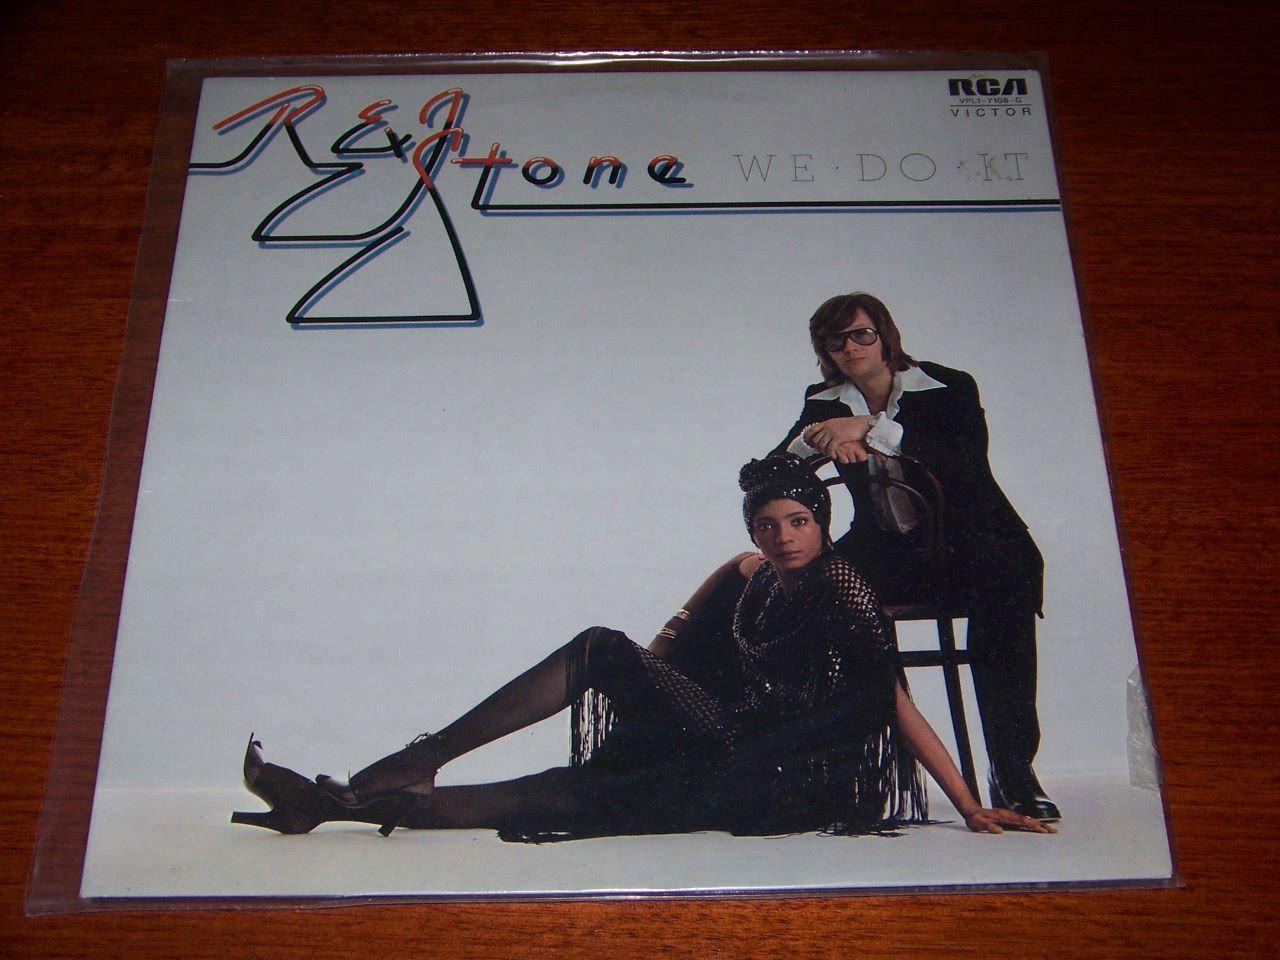 We-Do-It-R-J-Stone-NEAR-MINT-1976-LP